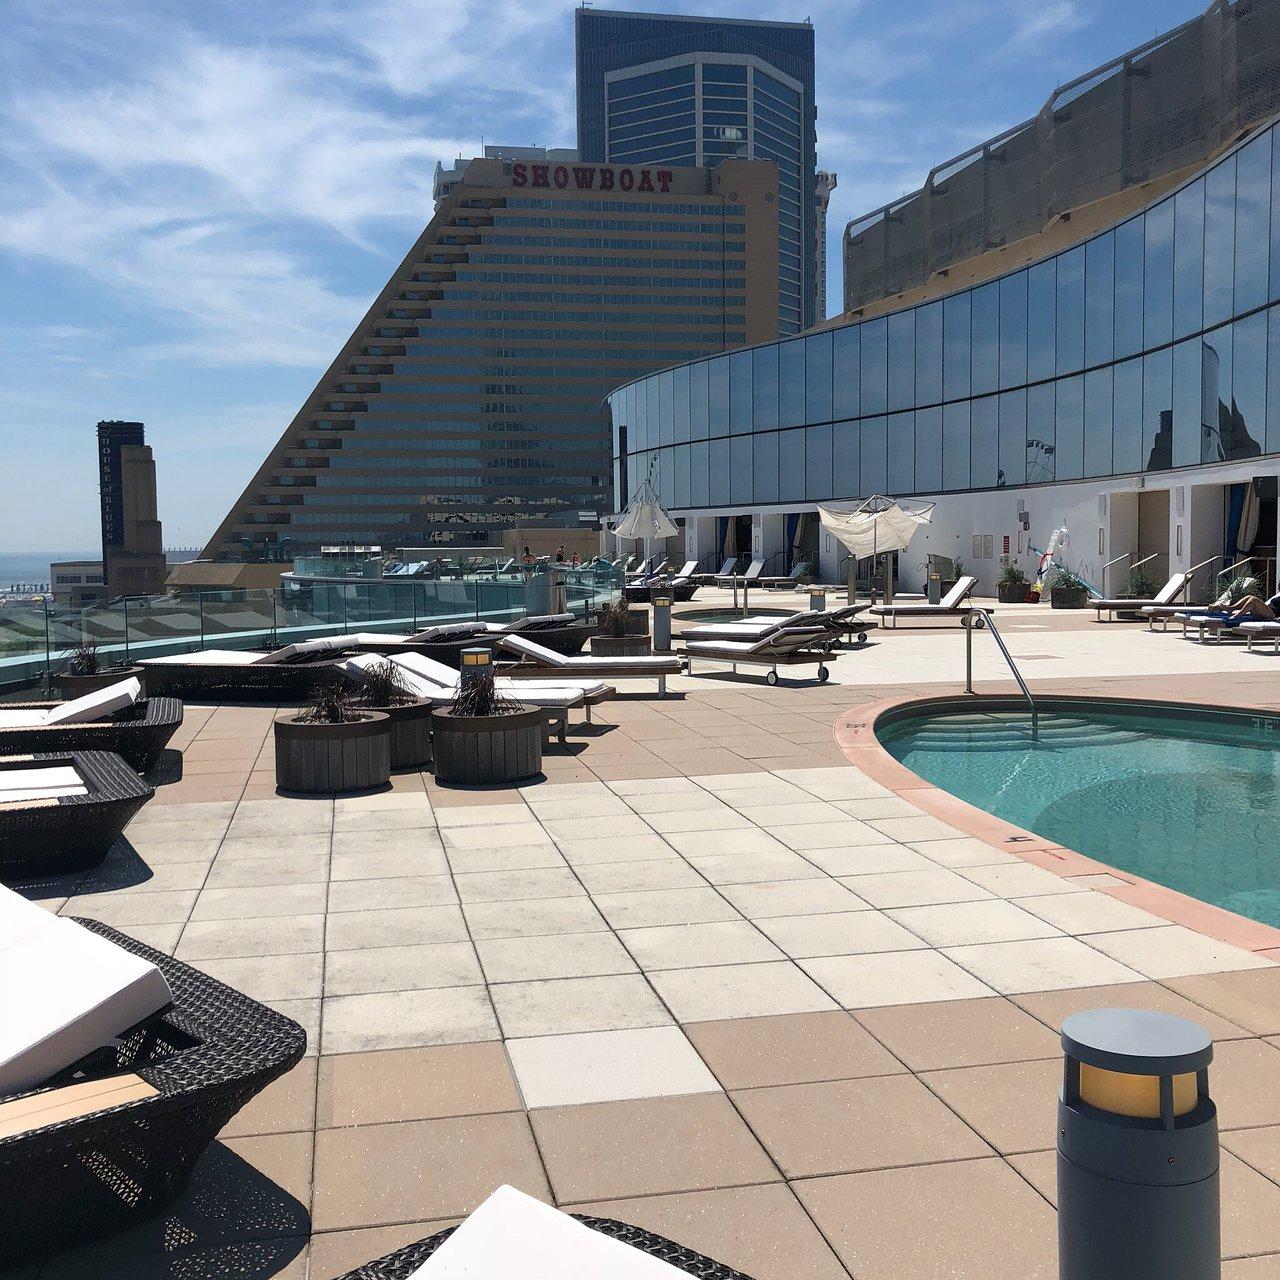 Ocean Resort Casino Atlantic City 2020 All You Need To Know Before You Go With Photos Tripadvisor